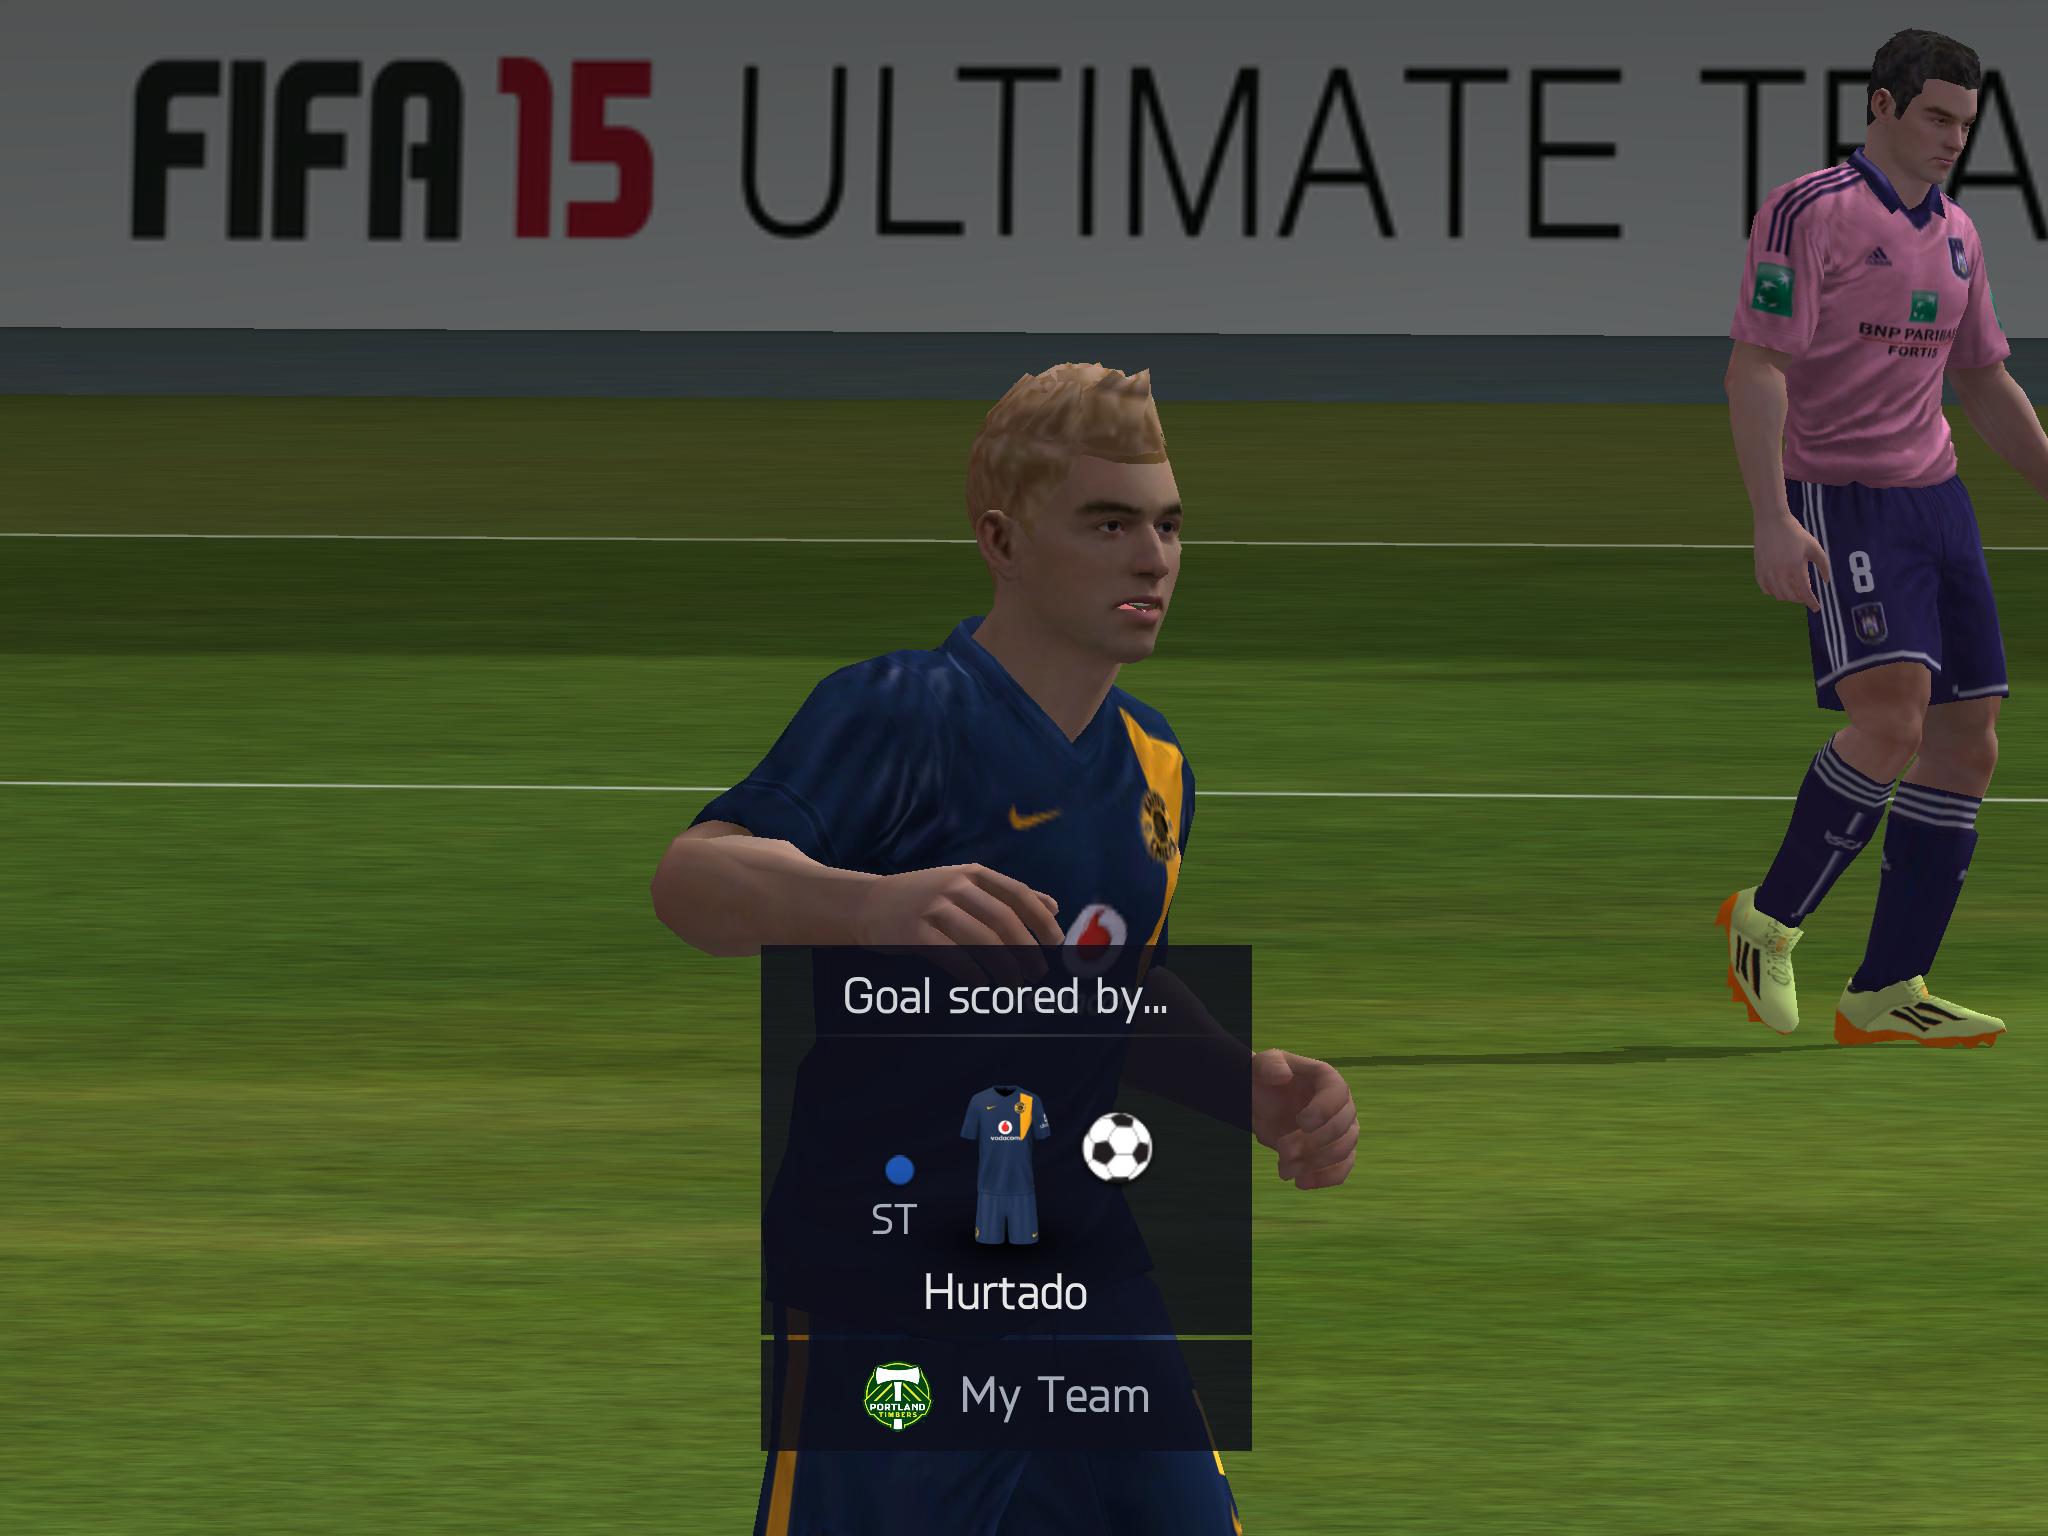 Fifa 15 ultimate team ios 11